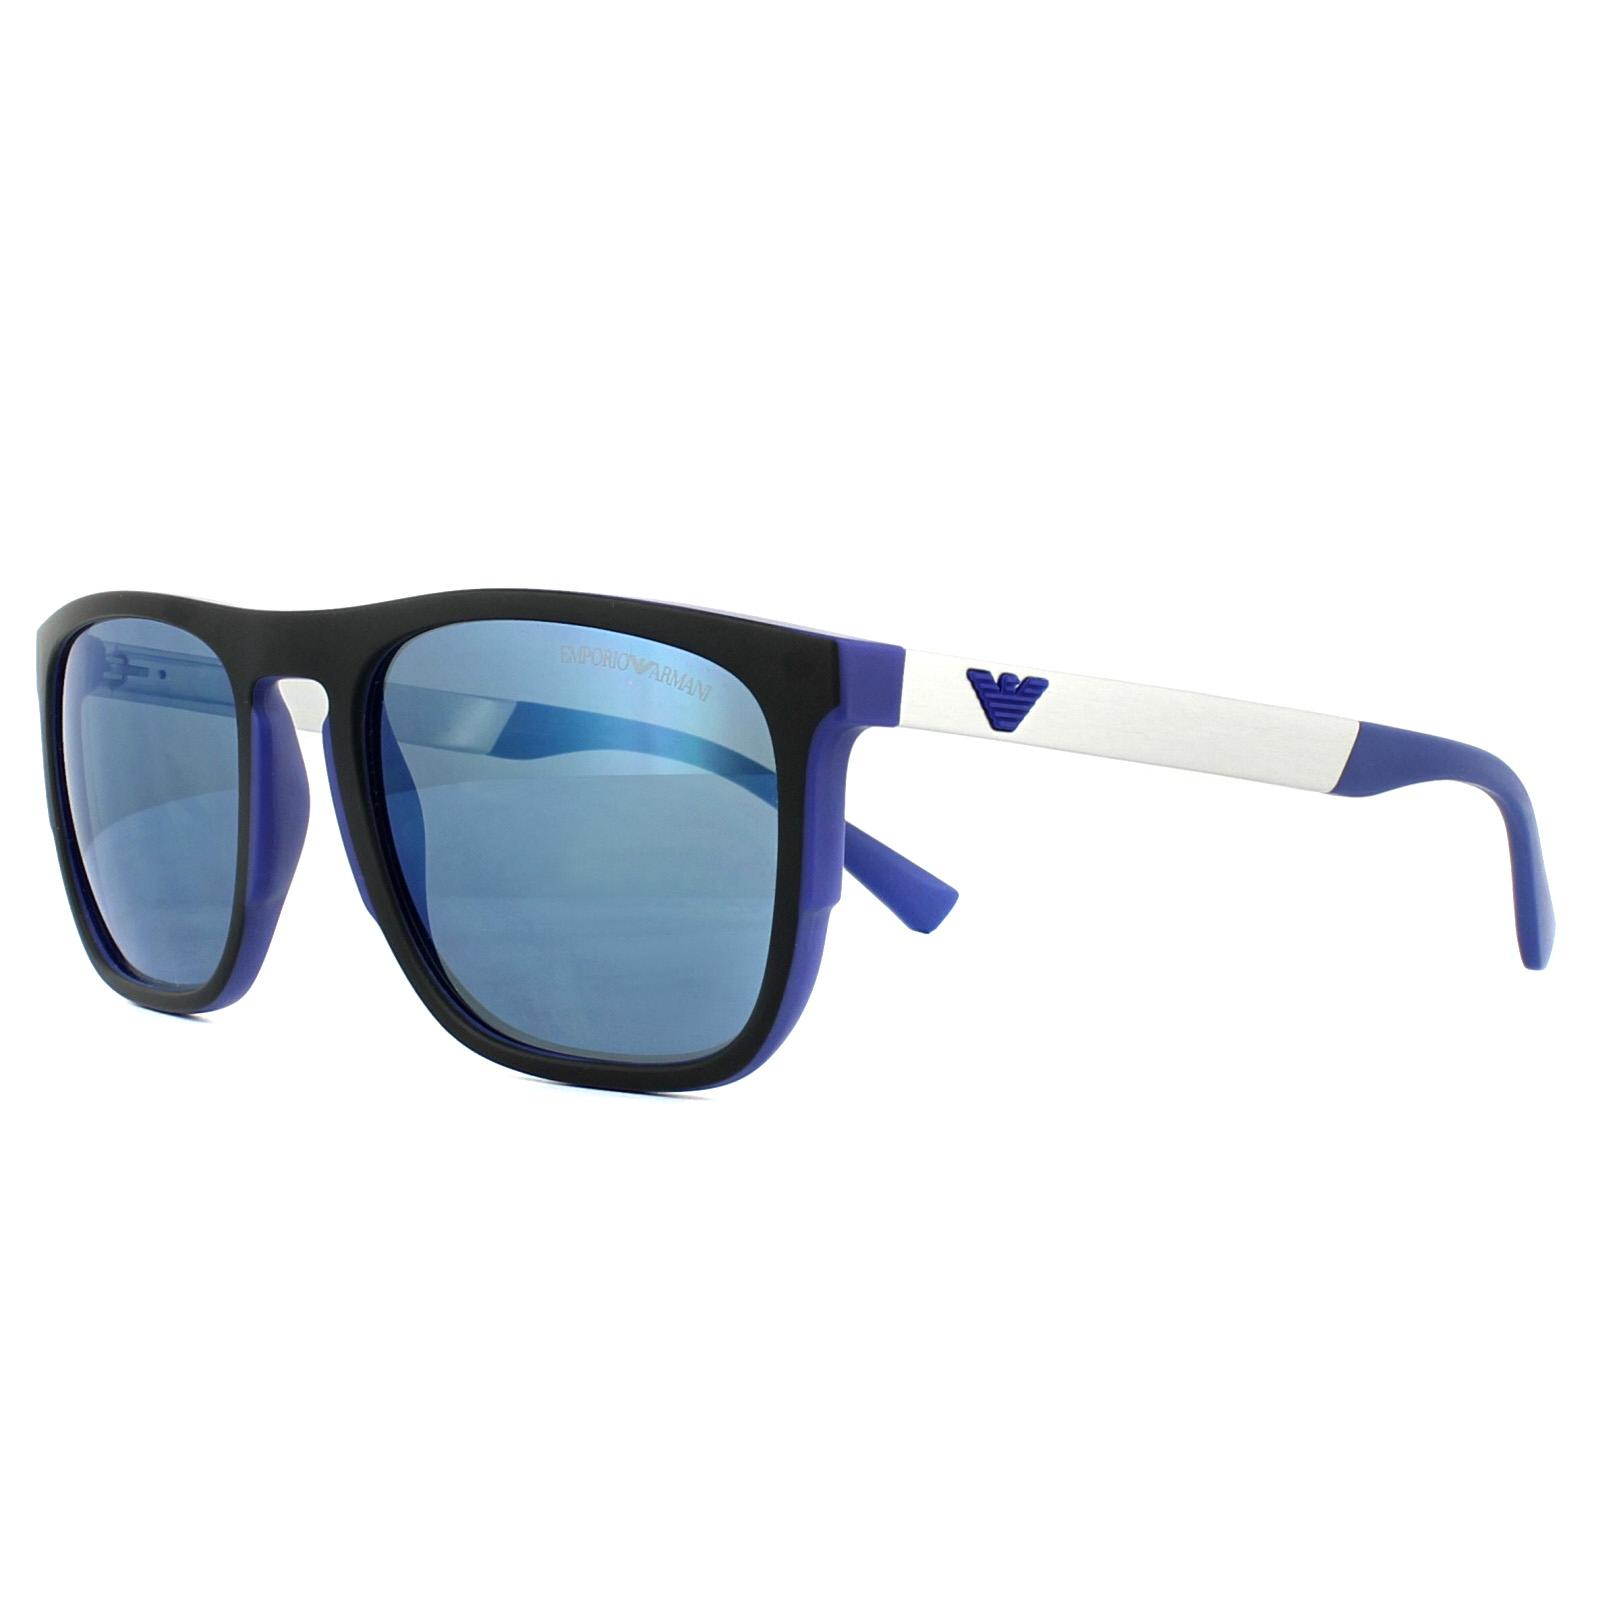 09649a0fdca Cheap Emporio Armani EA4114 Sunglasses - Discounted Sunglasses